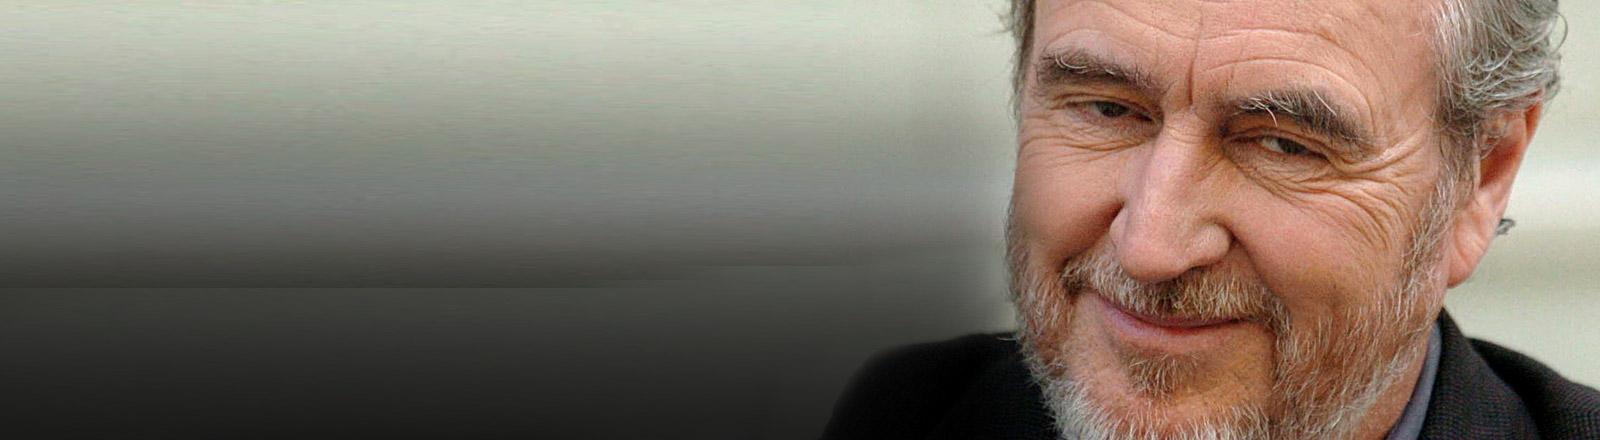 Horrofilm-Regisseur Wes Craven